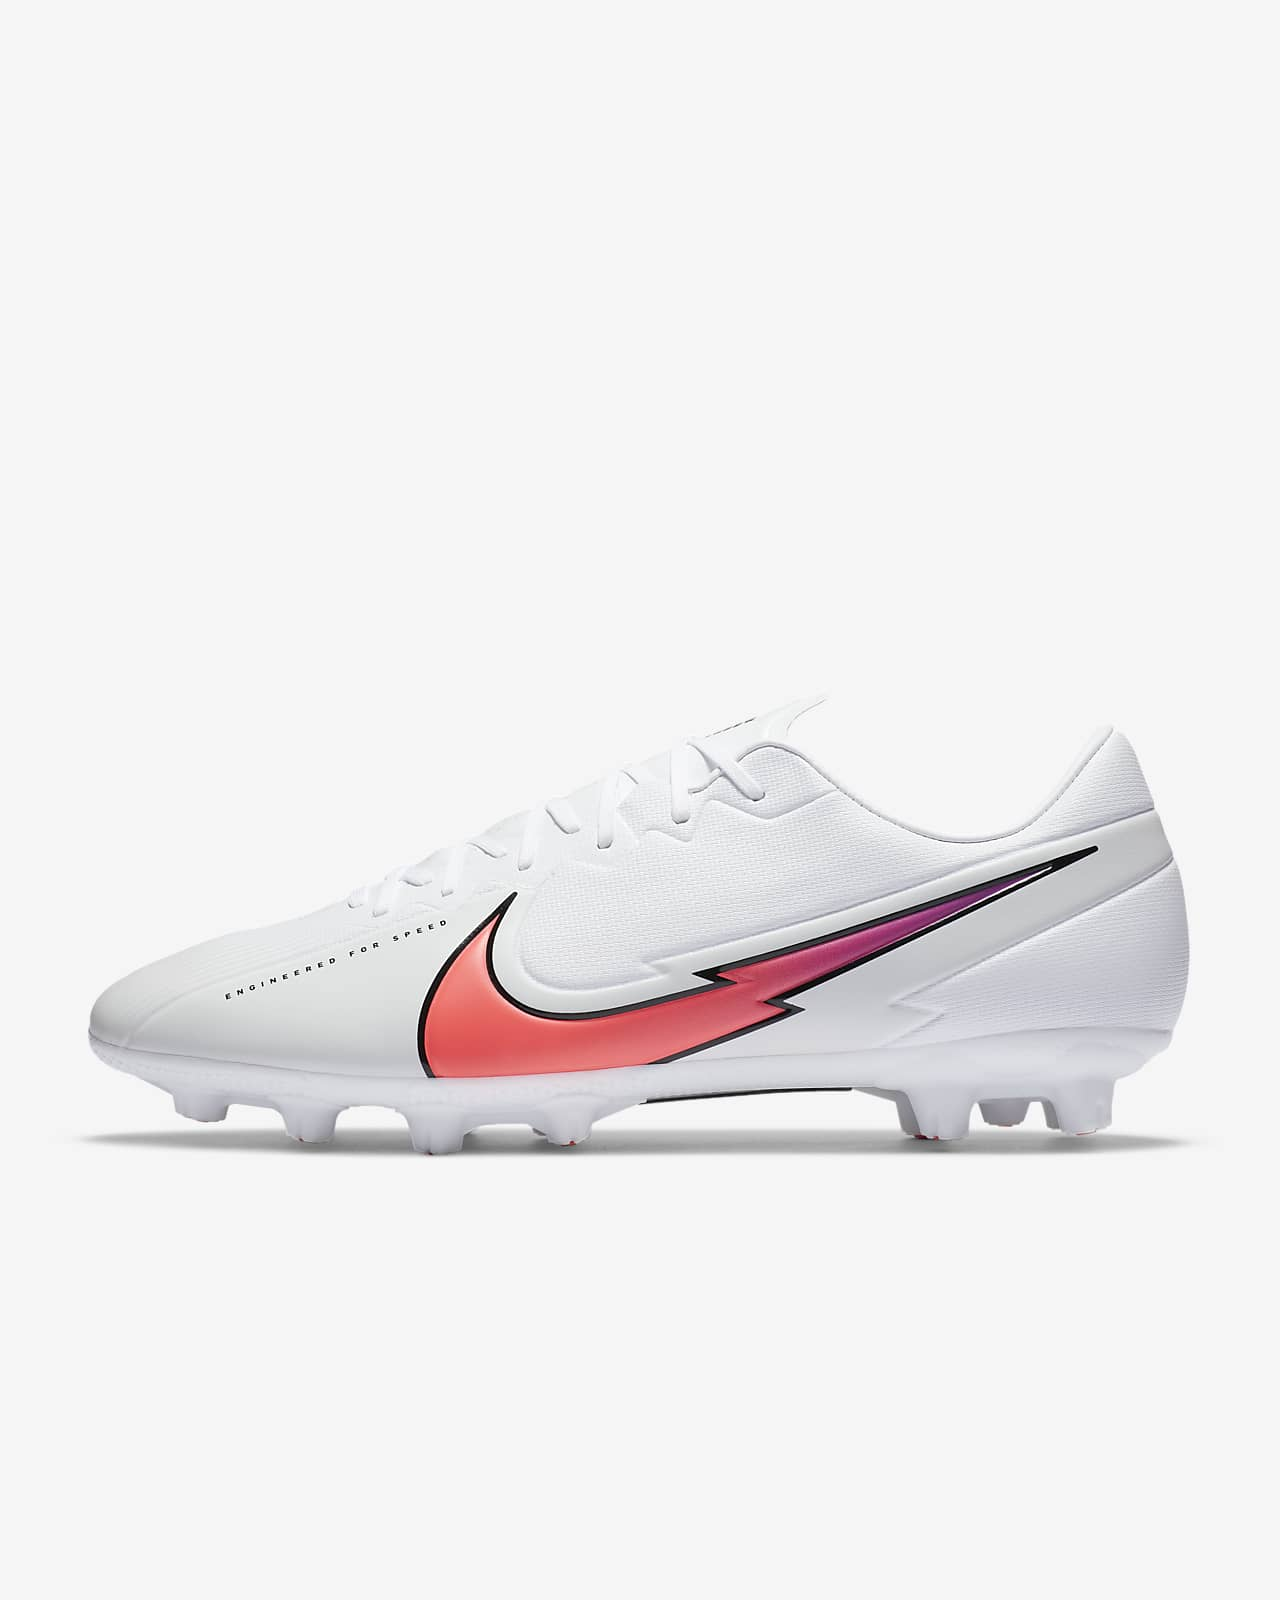 Nike Mercurial Vapor 13 Pro HG Hard-Ground Soccer Cleat